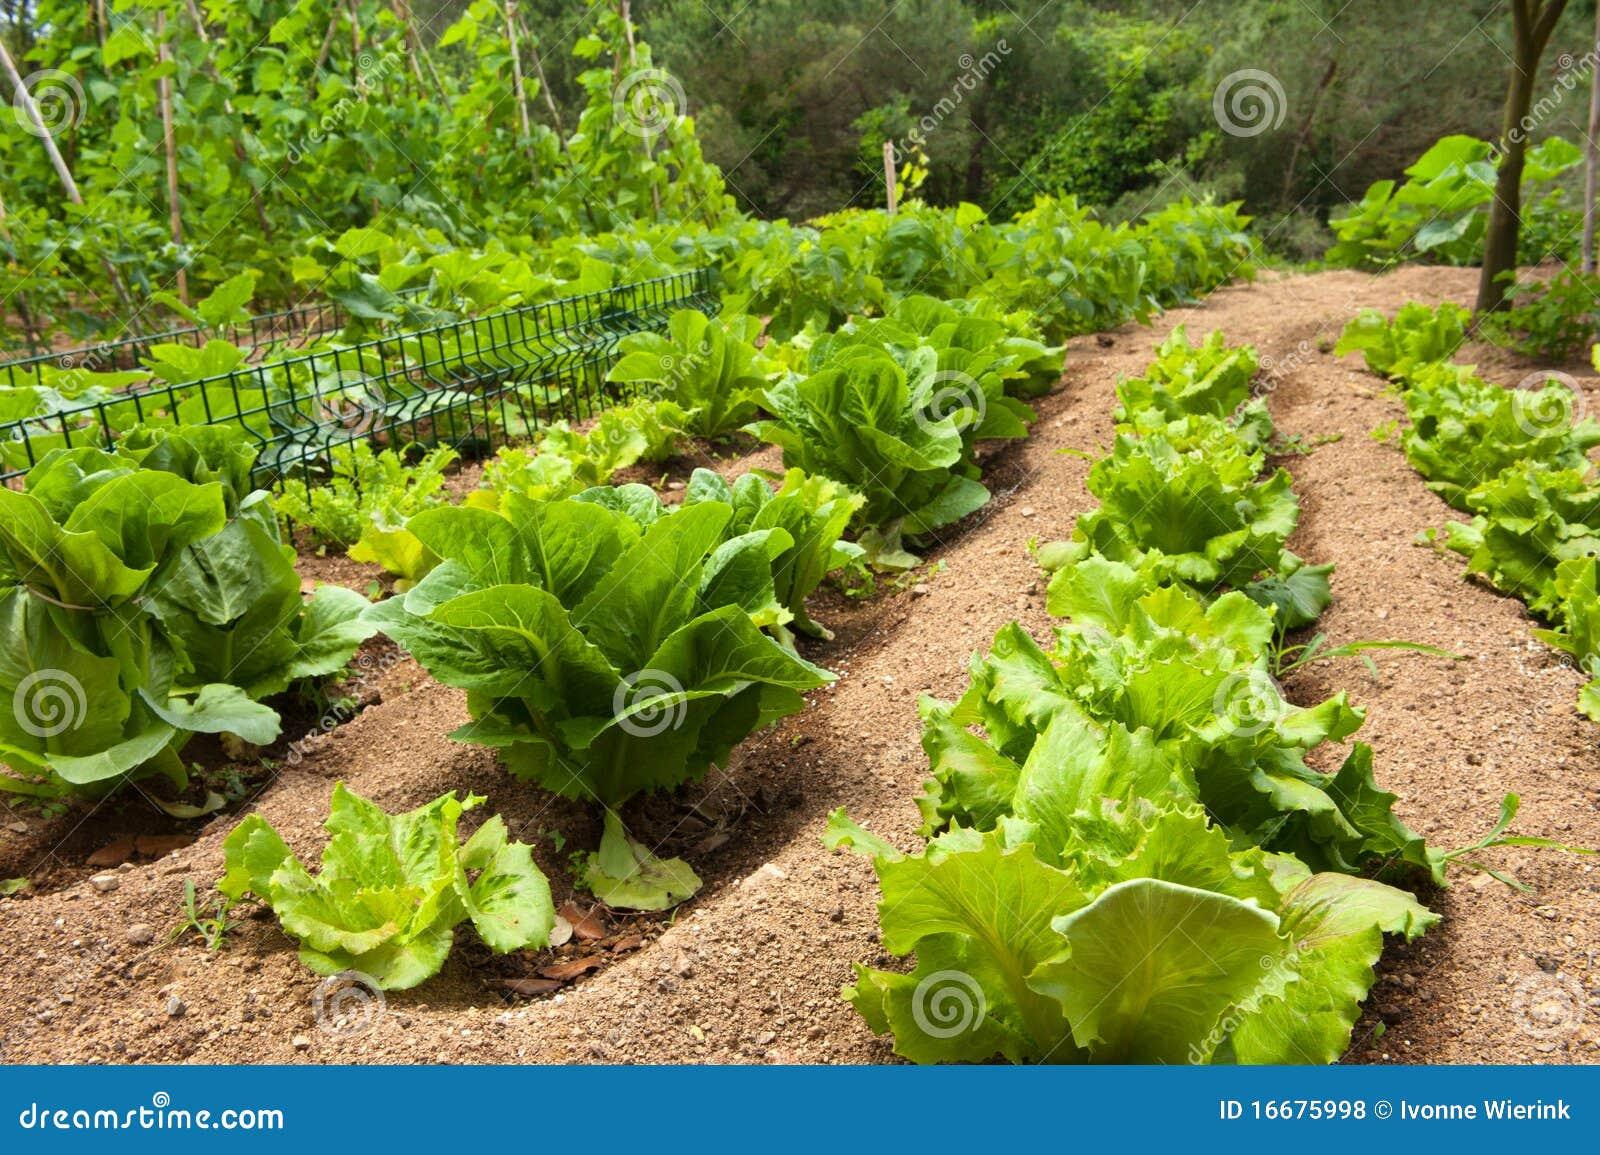 Backyard Vegetable Garden Business : Lettuce In The Vegetable Garden Royalty Free Stock Photos  Image